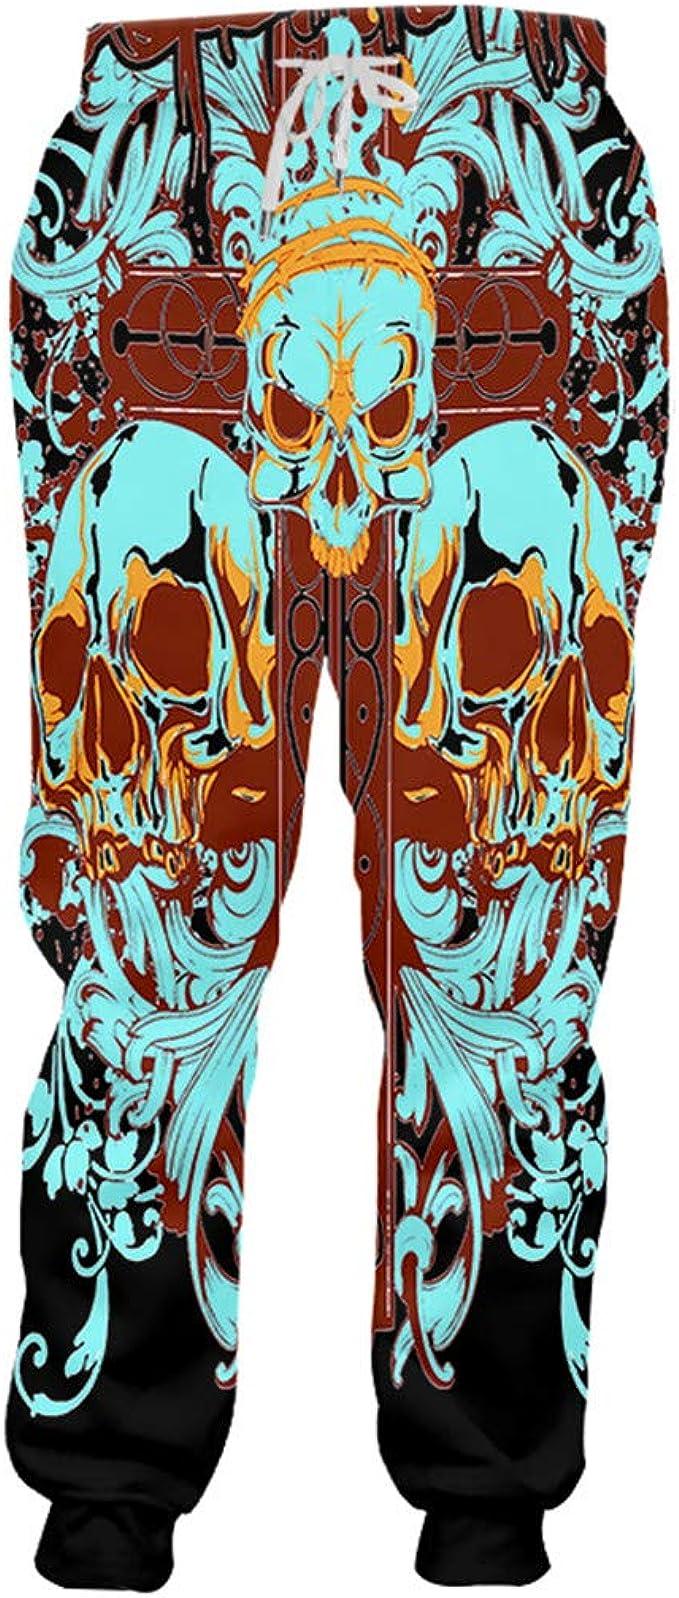 Pantalones de chándal de Hombre de Calavera Cruzada Impresos ...